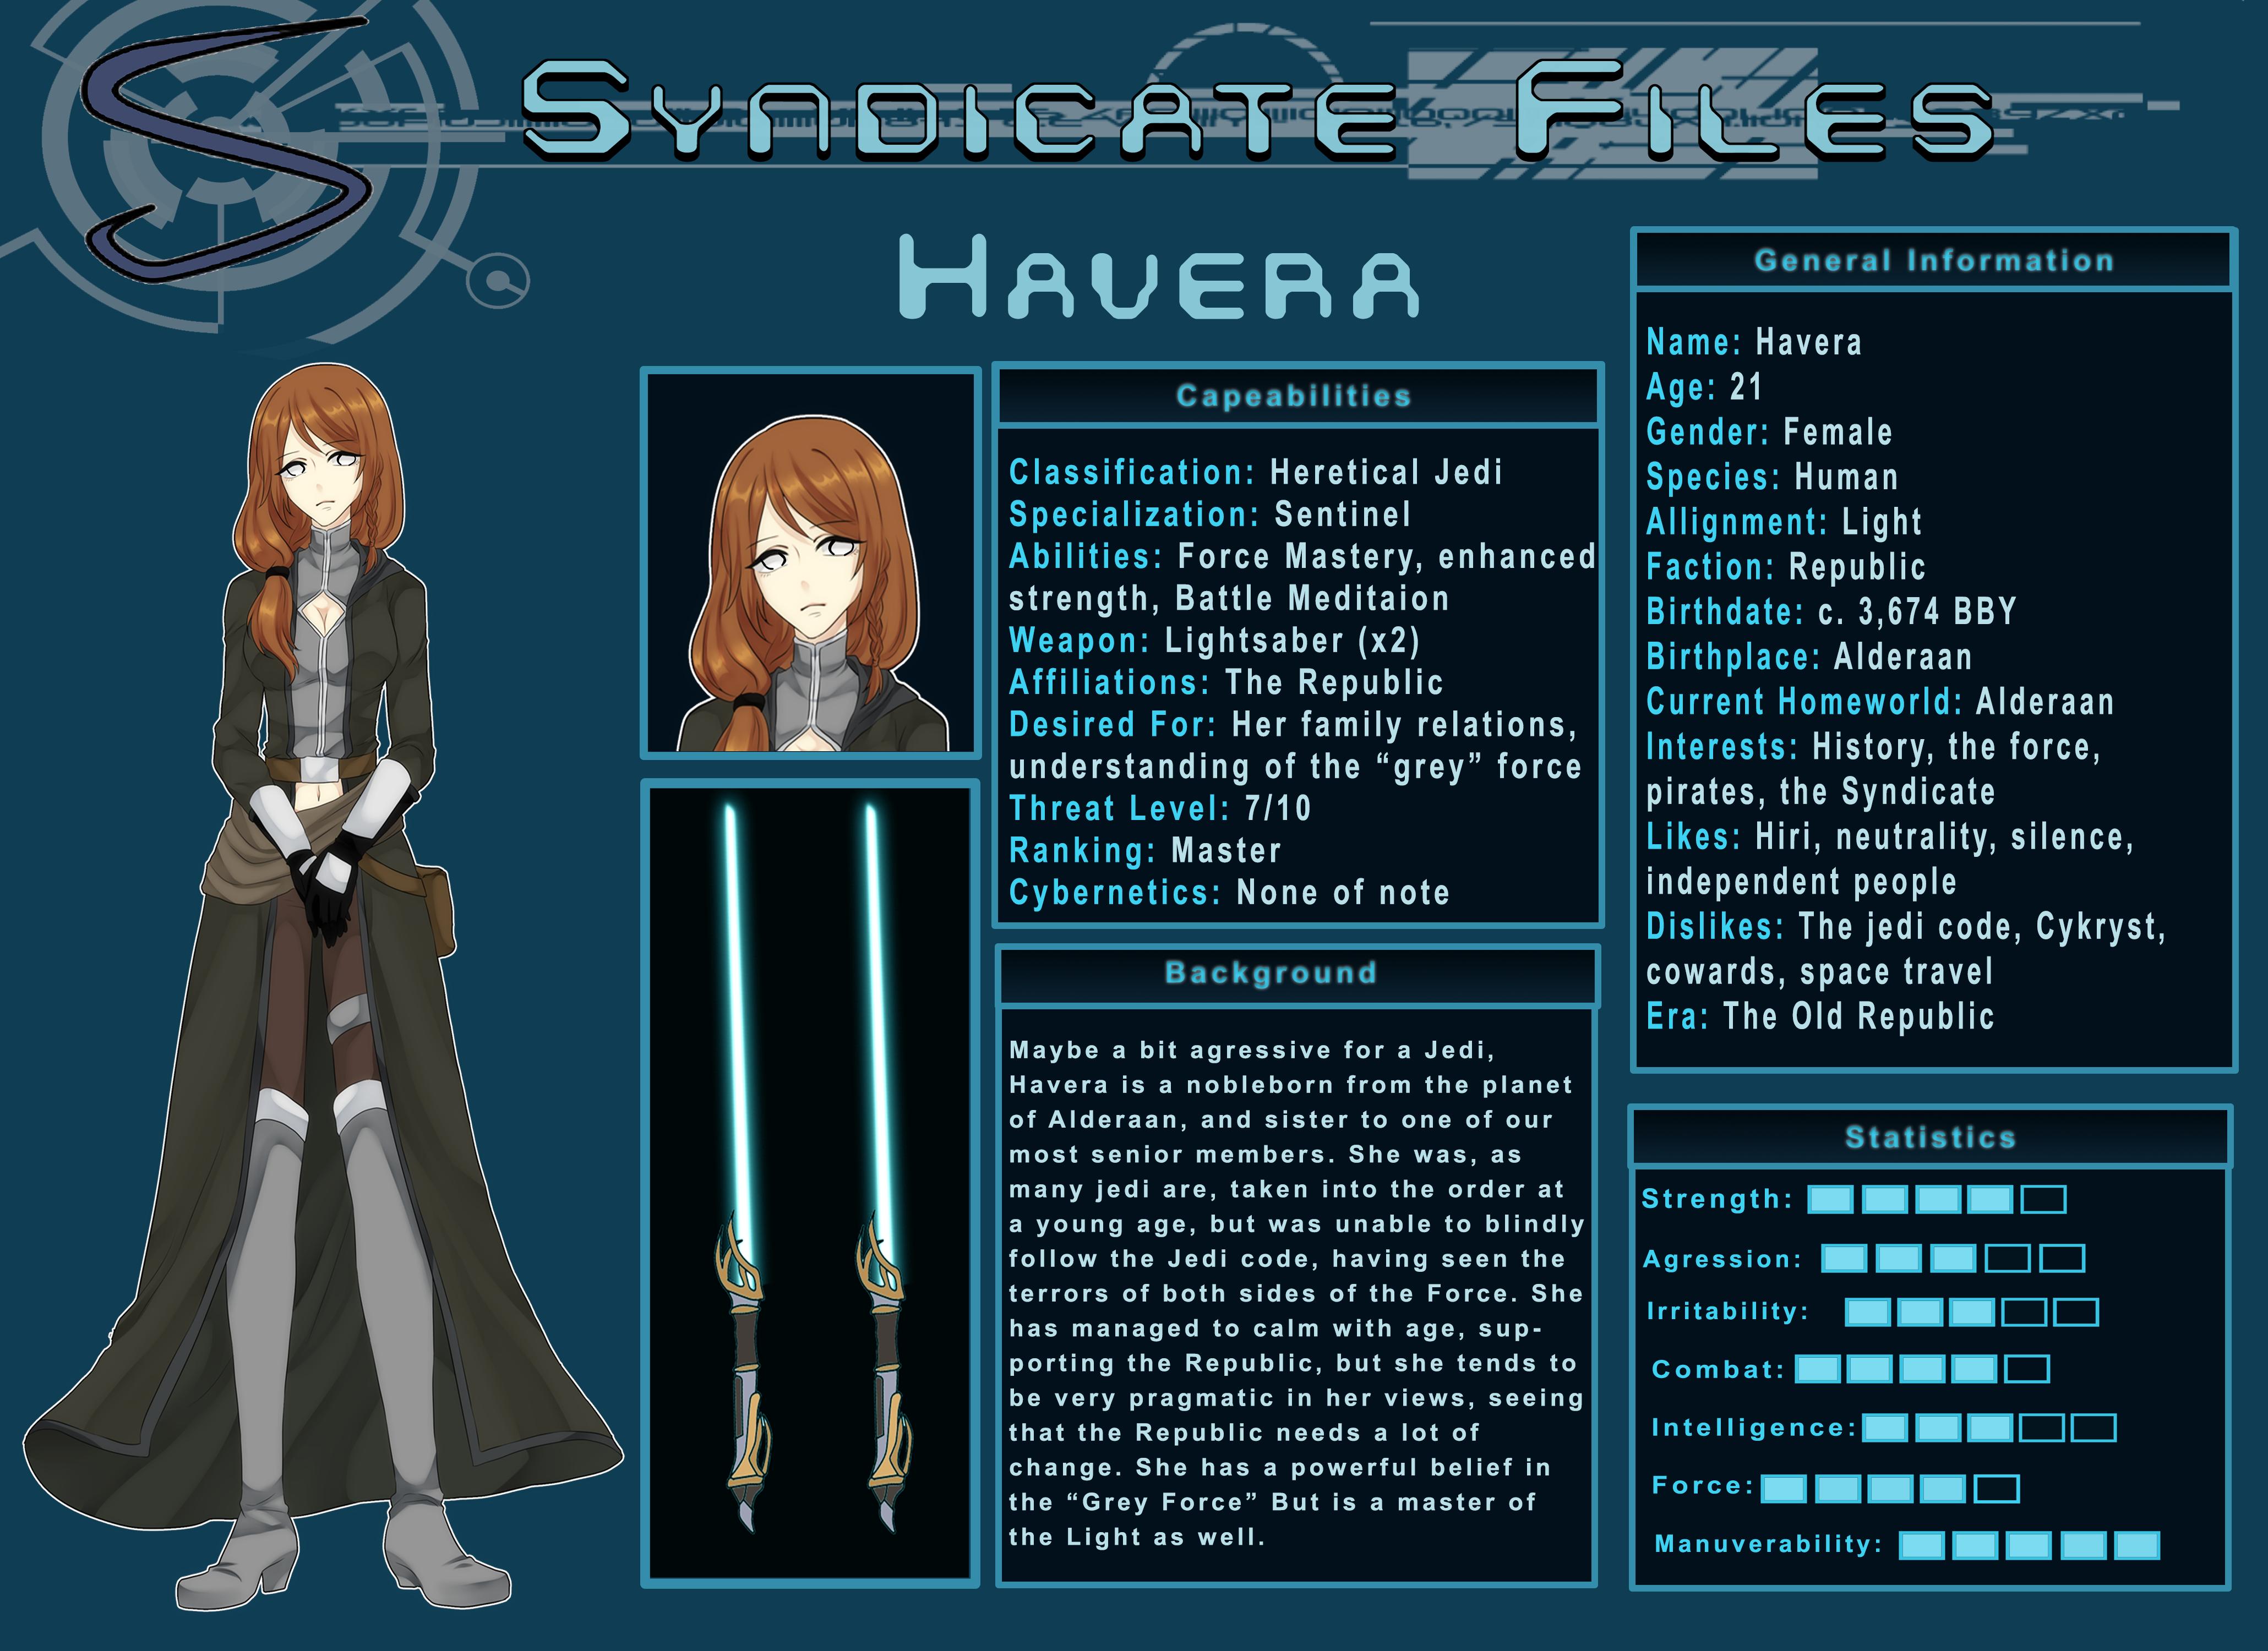 Star Wars OC: Havera Syndicate File by azulann on DeviantArt